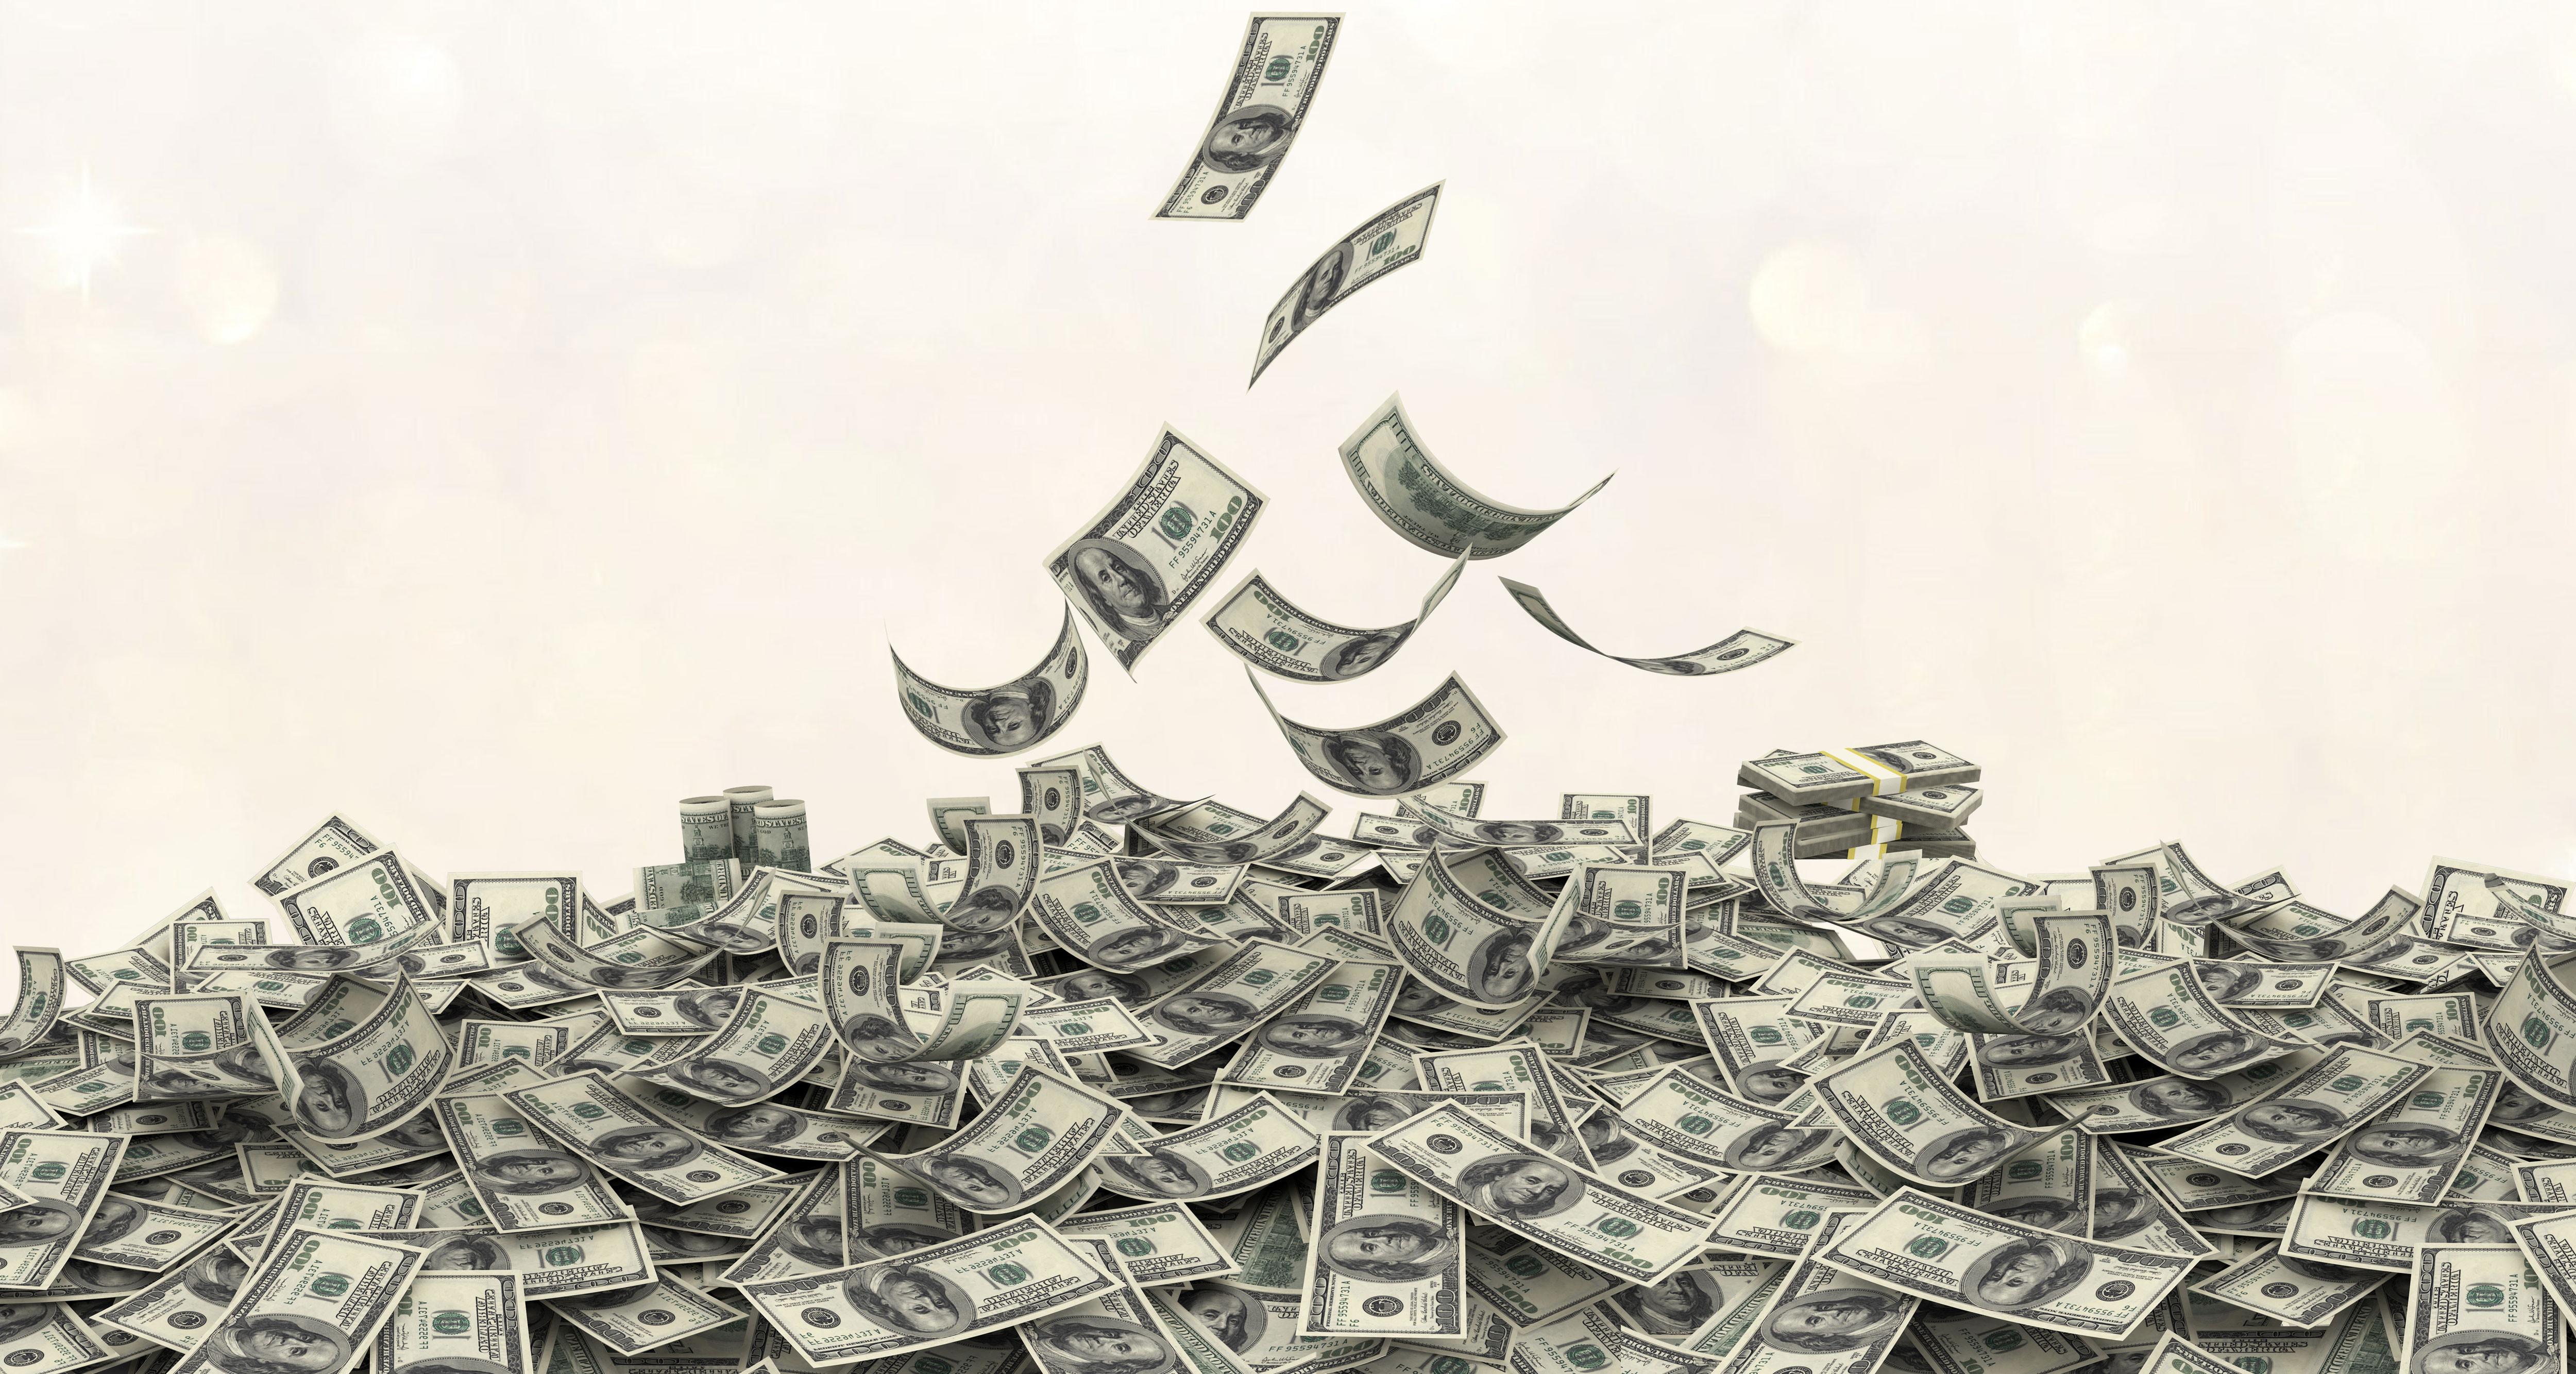 50 Years of Winning Slots Promotion $50,000 in Prizes | Westgate Las Vegas Resort & Casino